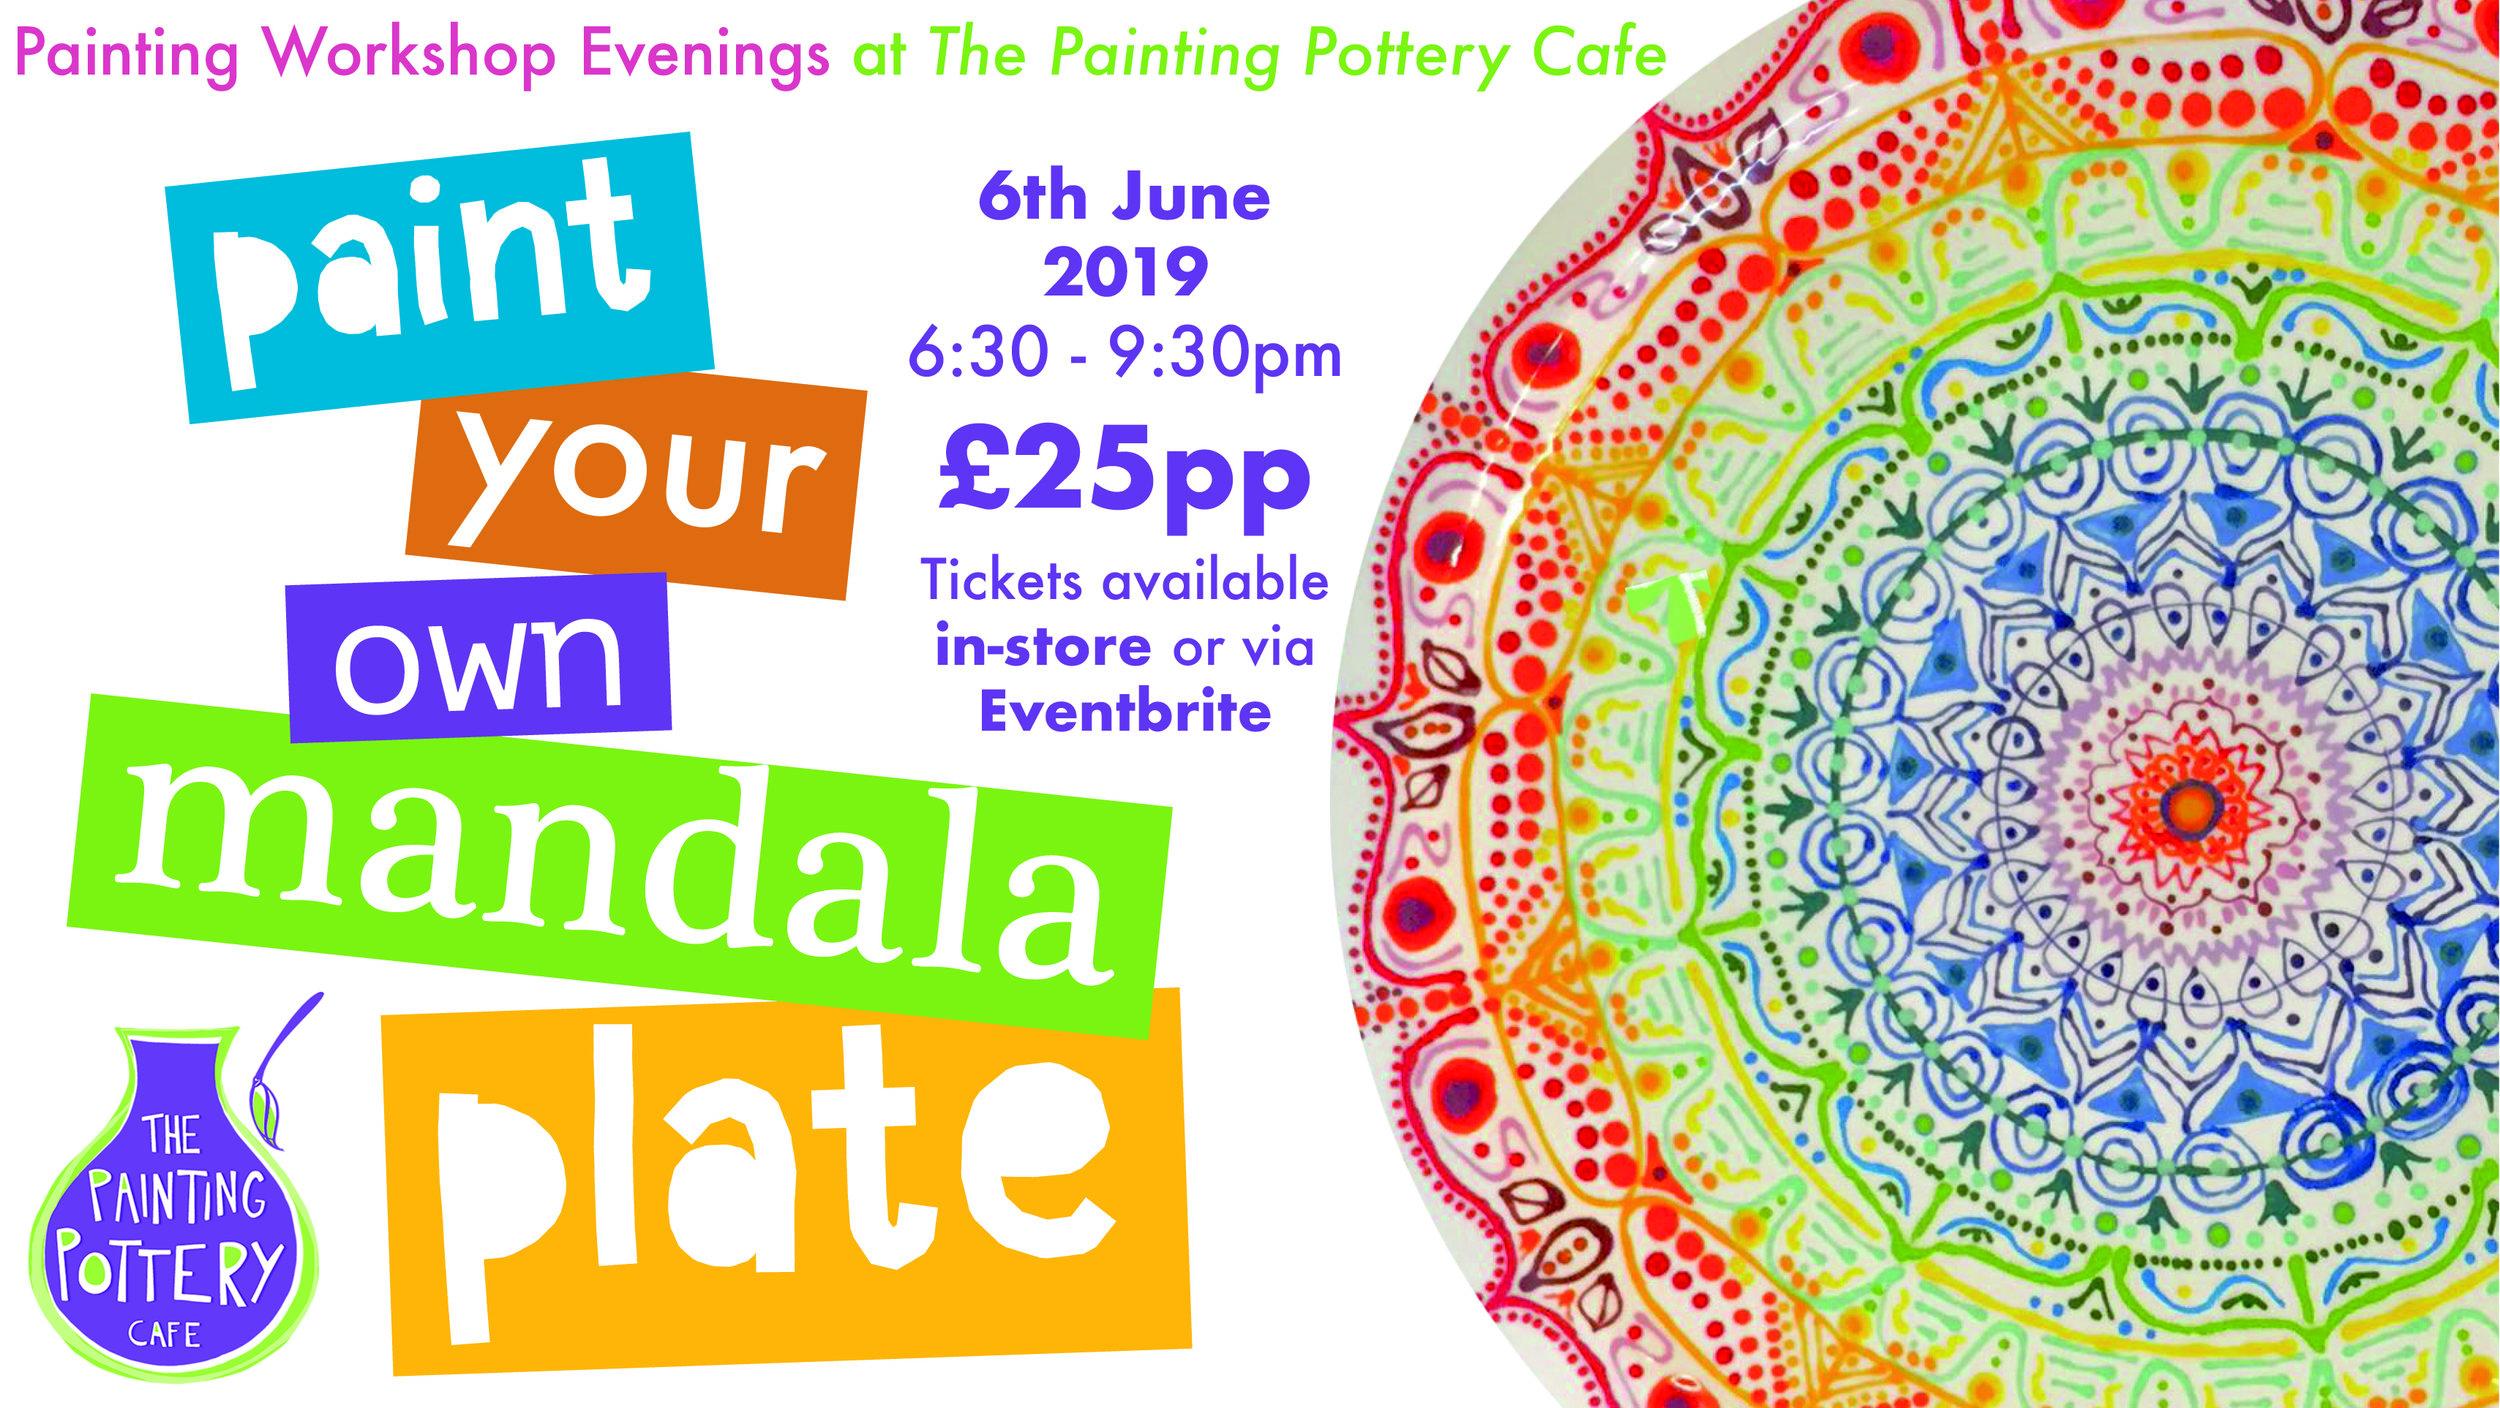 Painting workshops mandala plate banner.jpg